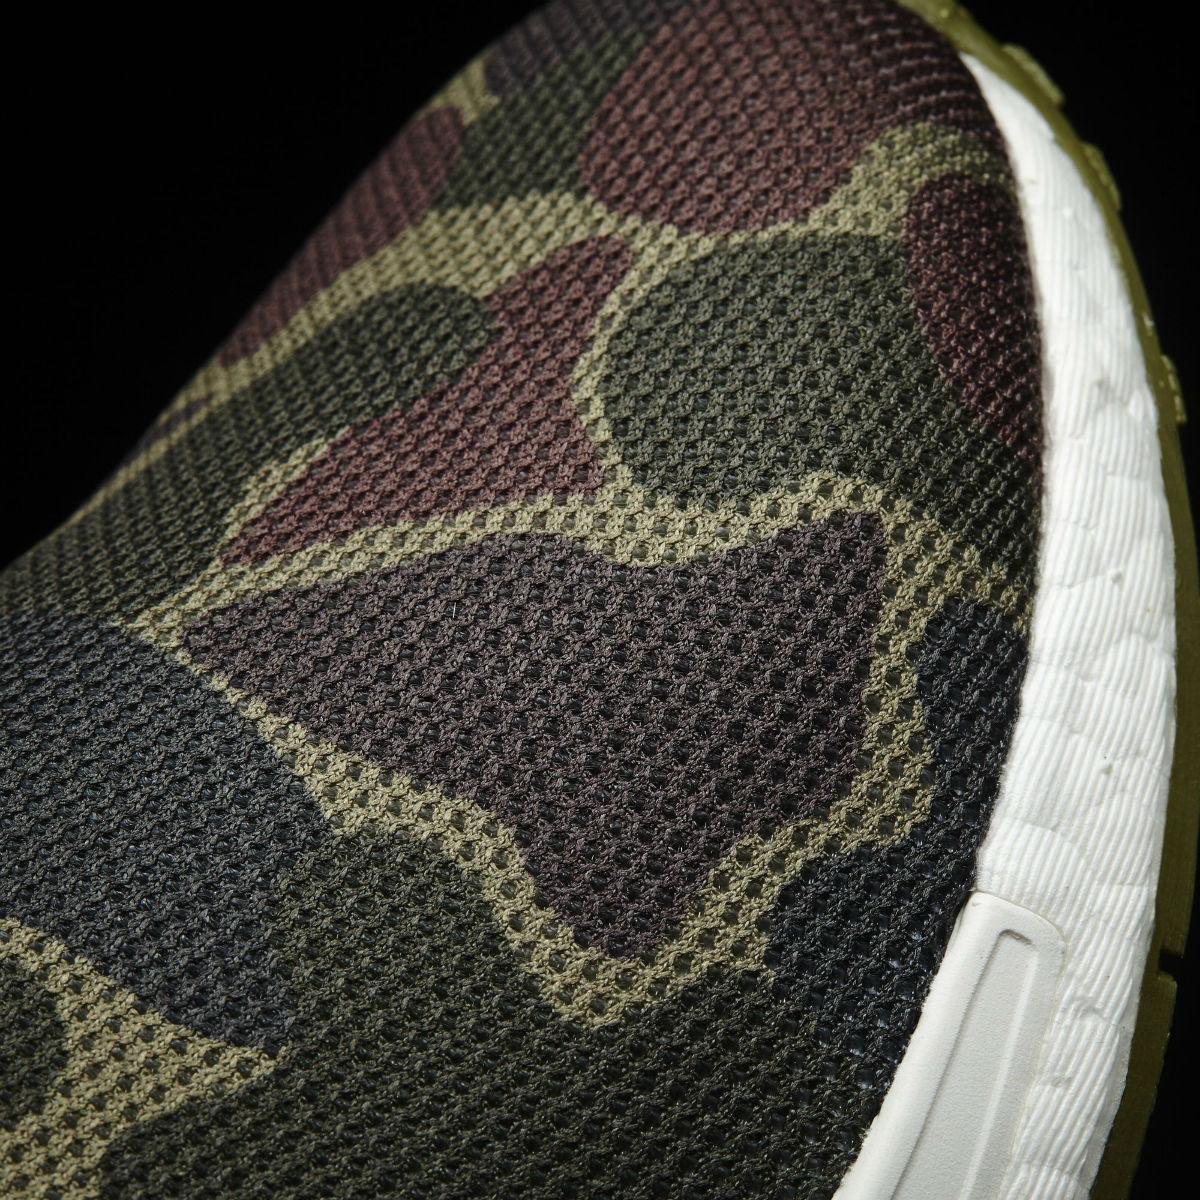 Adidas Donne Nmd Camo Verde sscyTHWs2